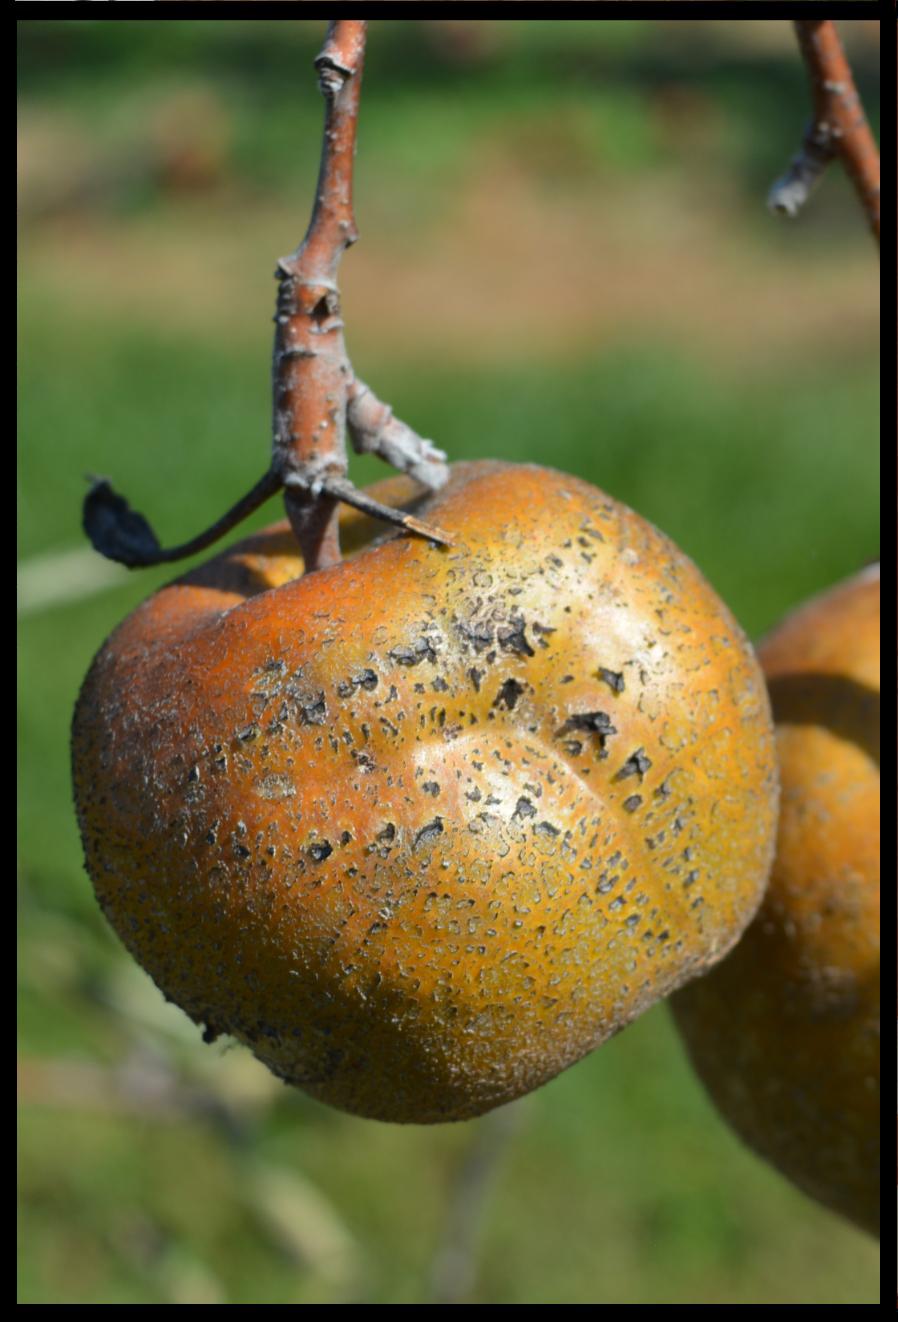 rough brown apple with some orange blush